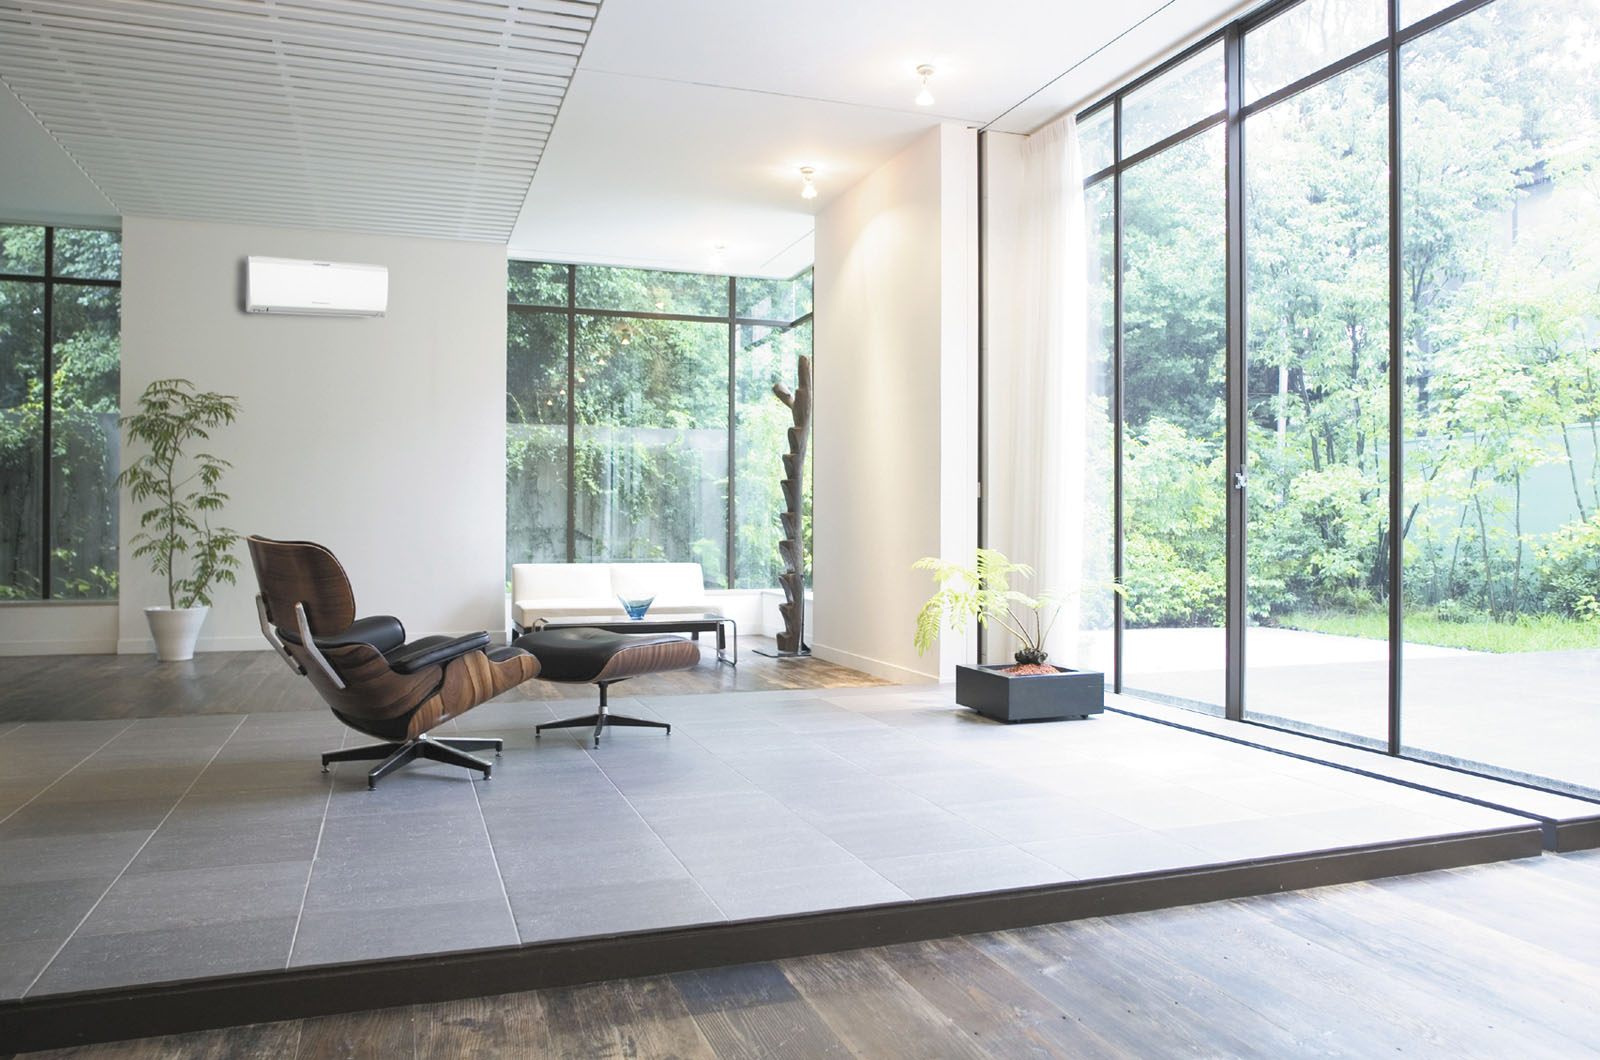 Airco Slaapkamer Inbouwen : Airco nodig airvek airconditioning te rotterdam